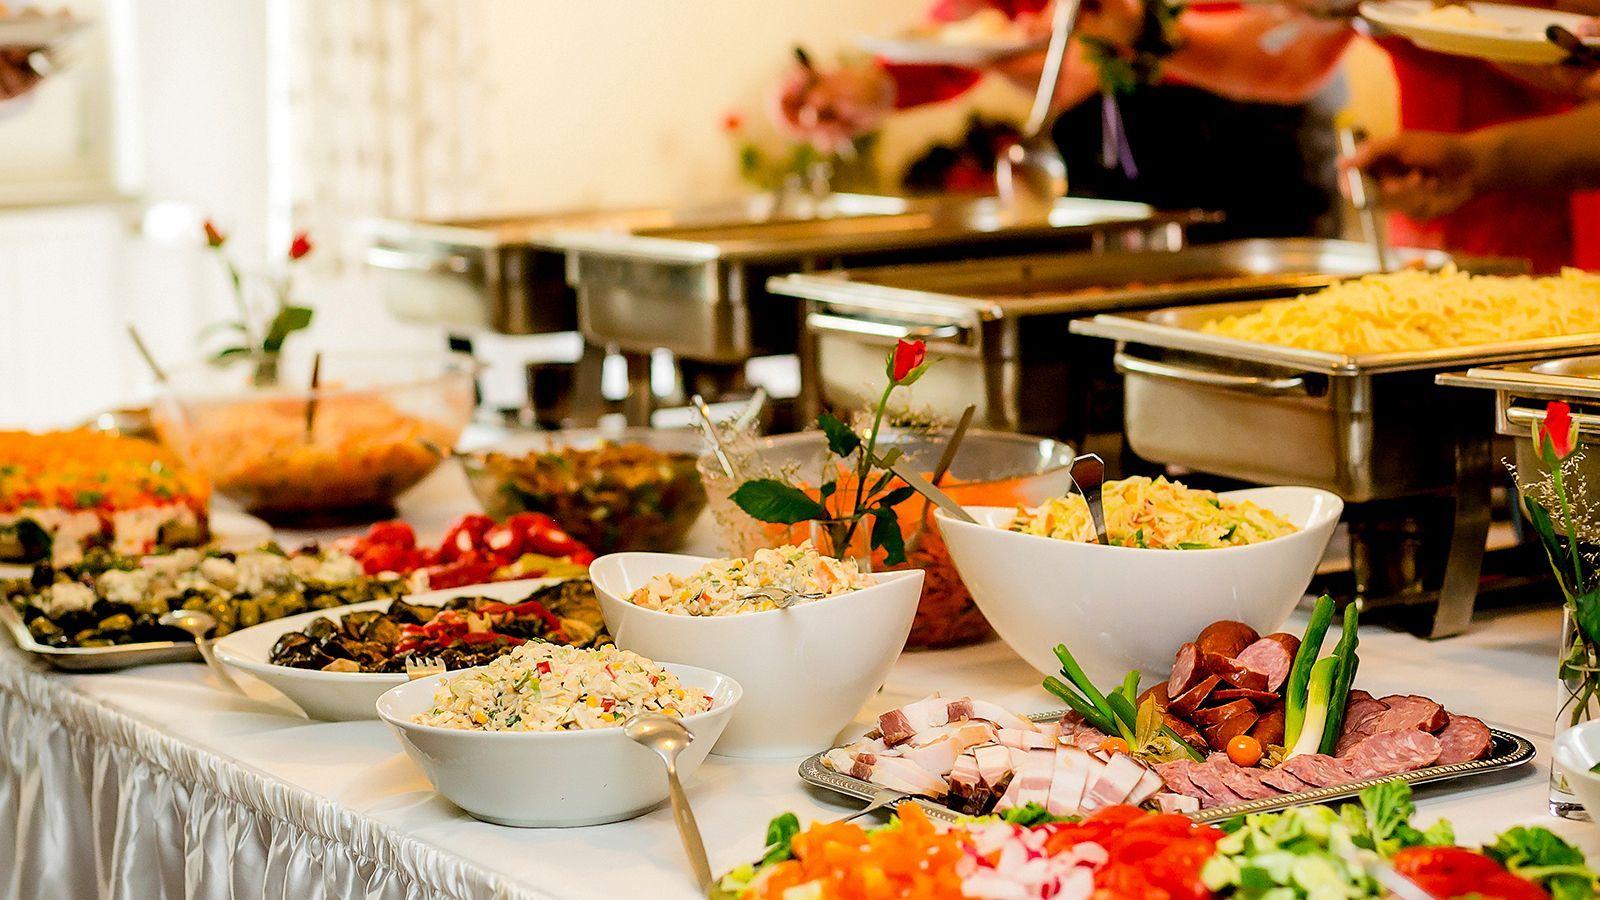 Orlando Food Truck Provides Health And Hygiene Aliment Wine Recipes Wedding Food Menu Indian Wedding Food